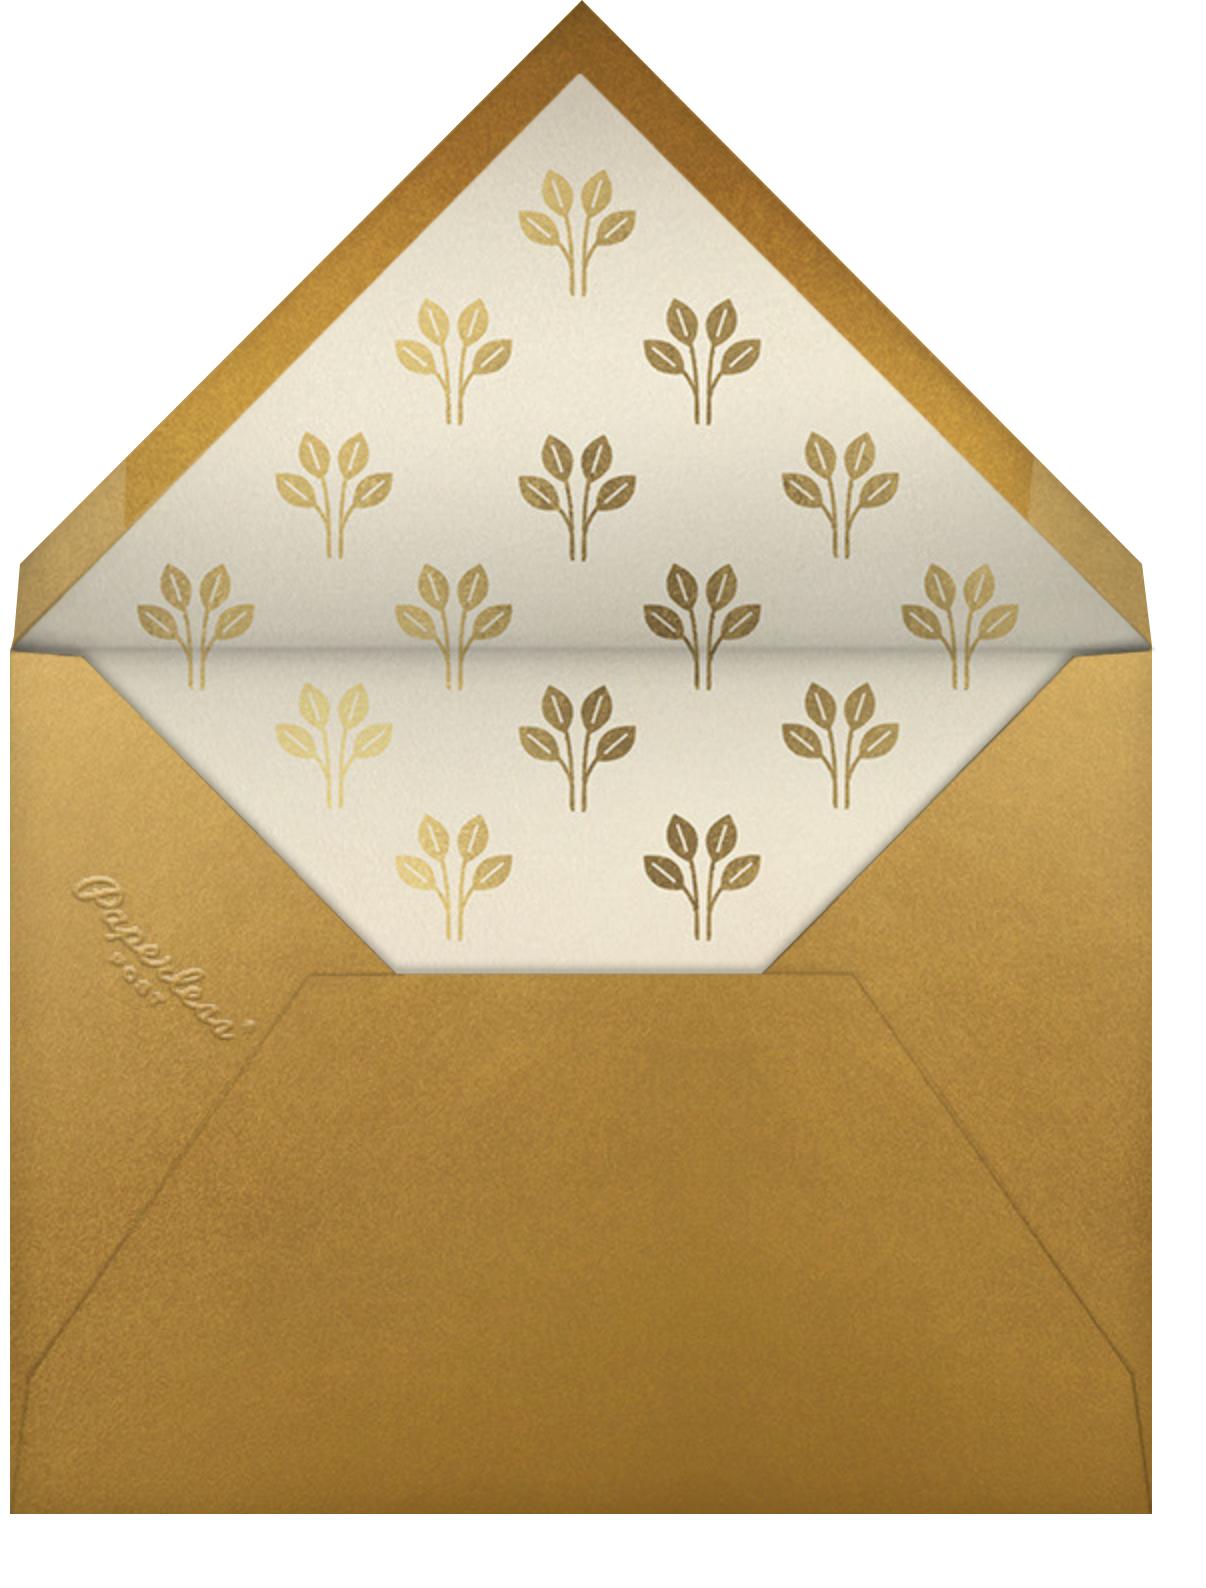 Roman à Clef - Paperless Post - Housewarming - envelope back